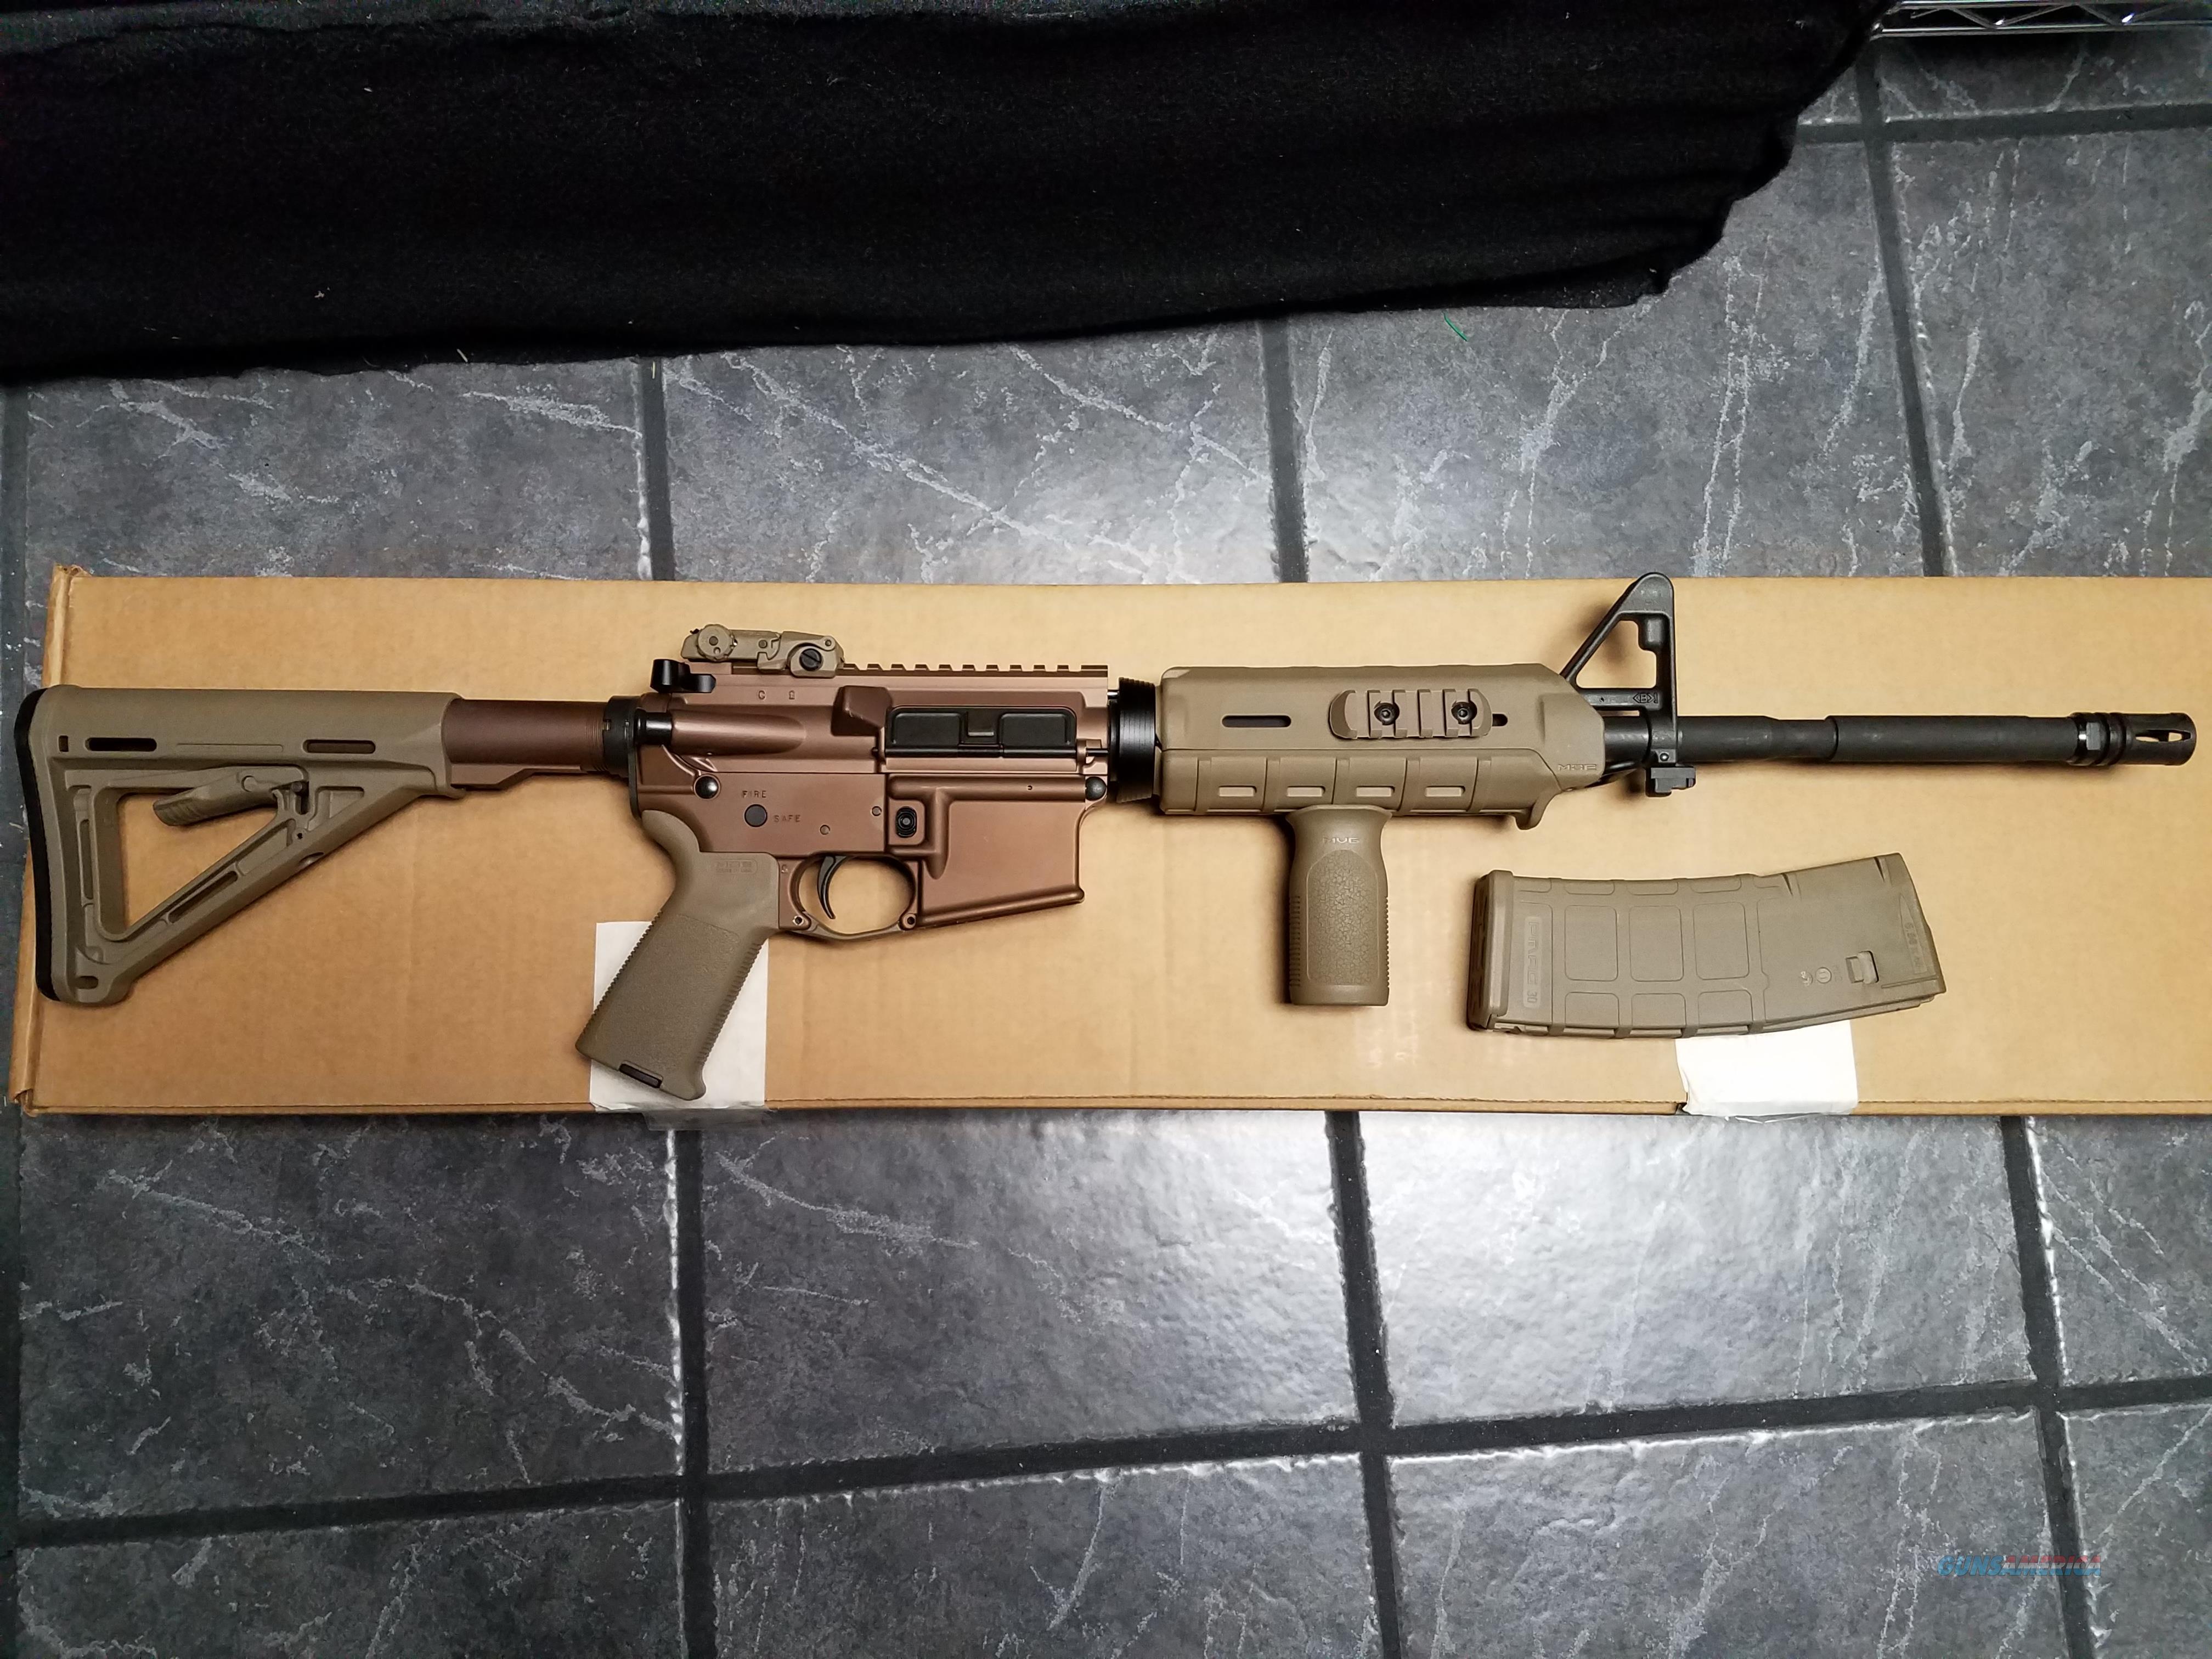 Colt Limited Edition M4 FDE Anodized Finish Rare LE6920MPFDE Magpul  Guns > Rifles > Colt Military/Tactical Rifles